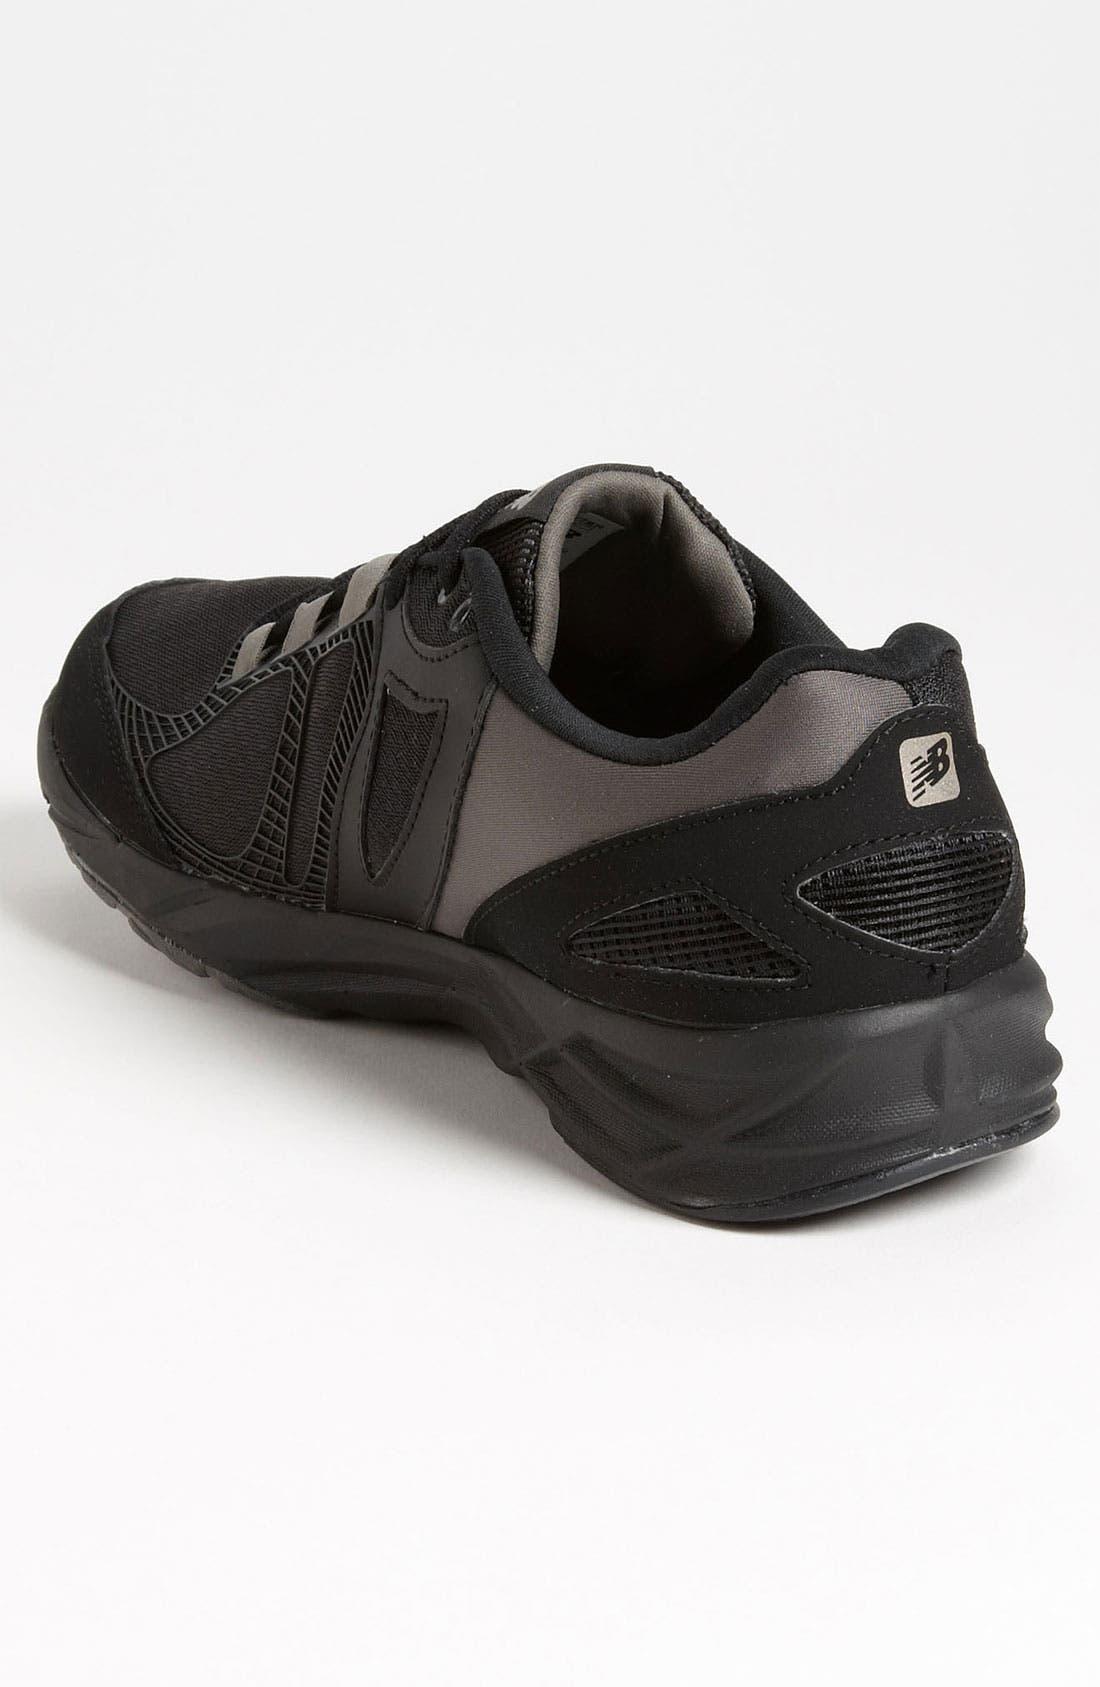 Alternate Image 2  - New Balance '877' Training Shoe (Men) (Online Only)